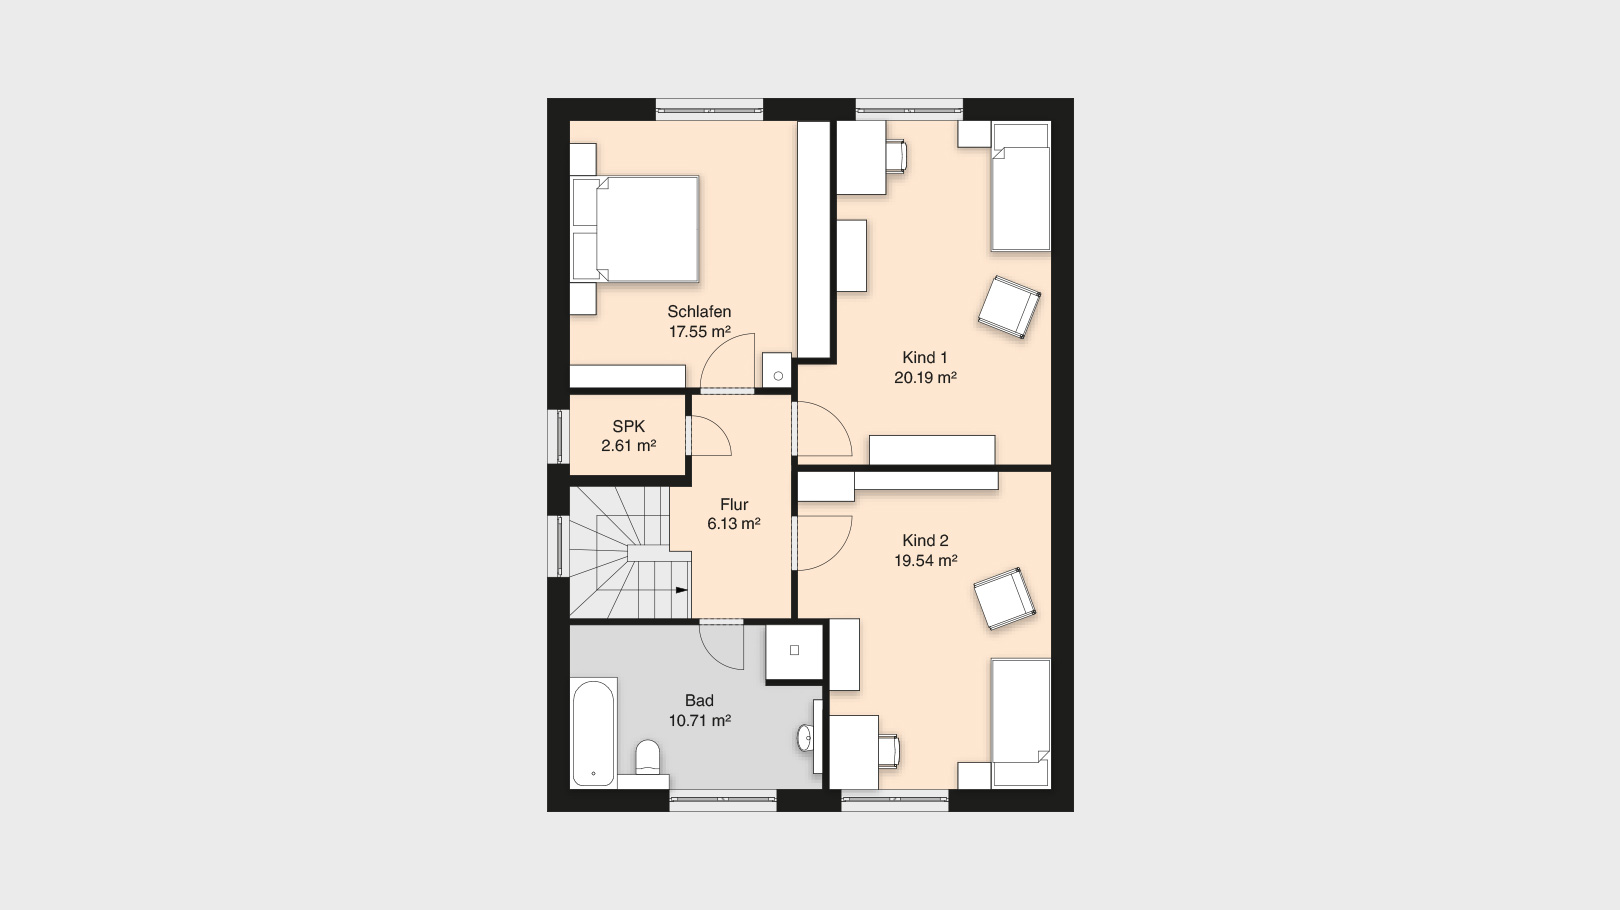 Haus-Idee Sonneberg